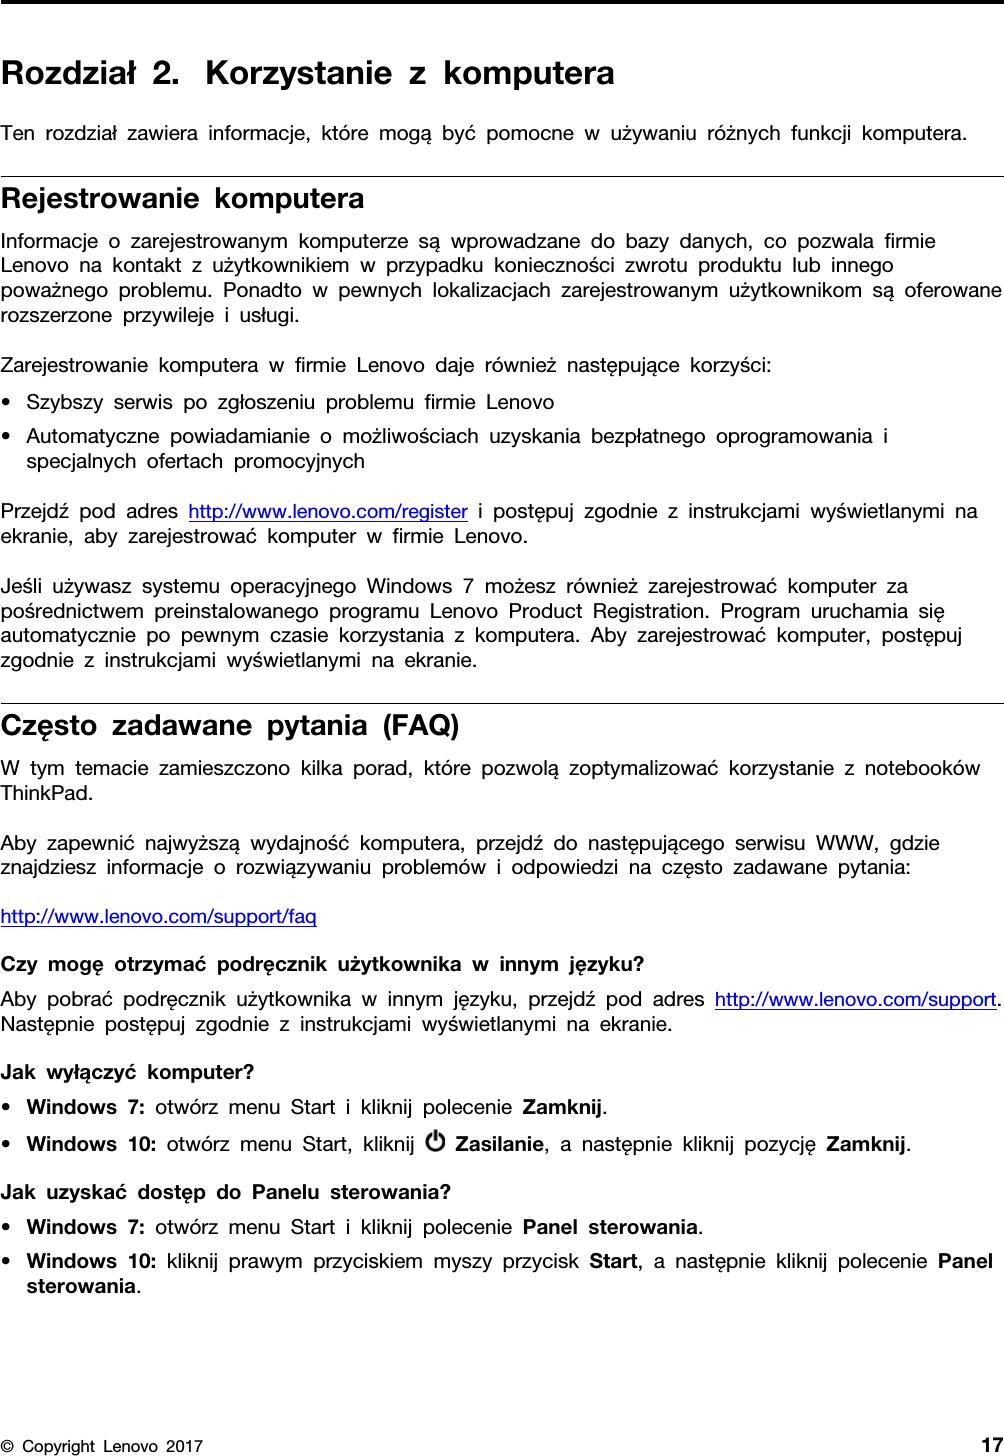 hrvatski randkowy stranice